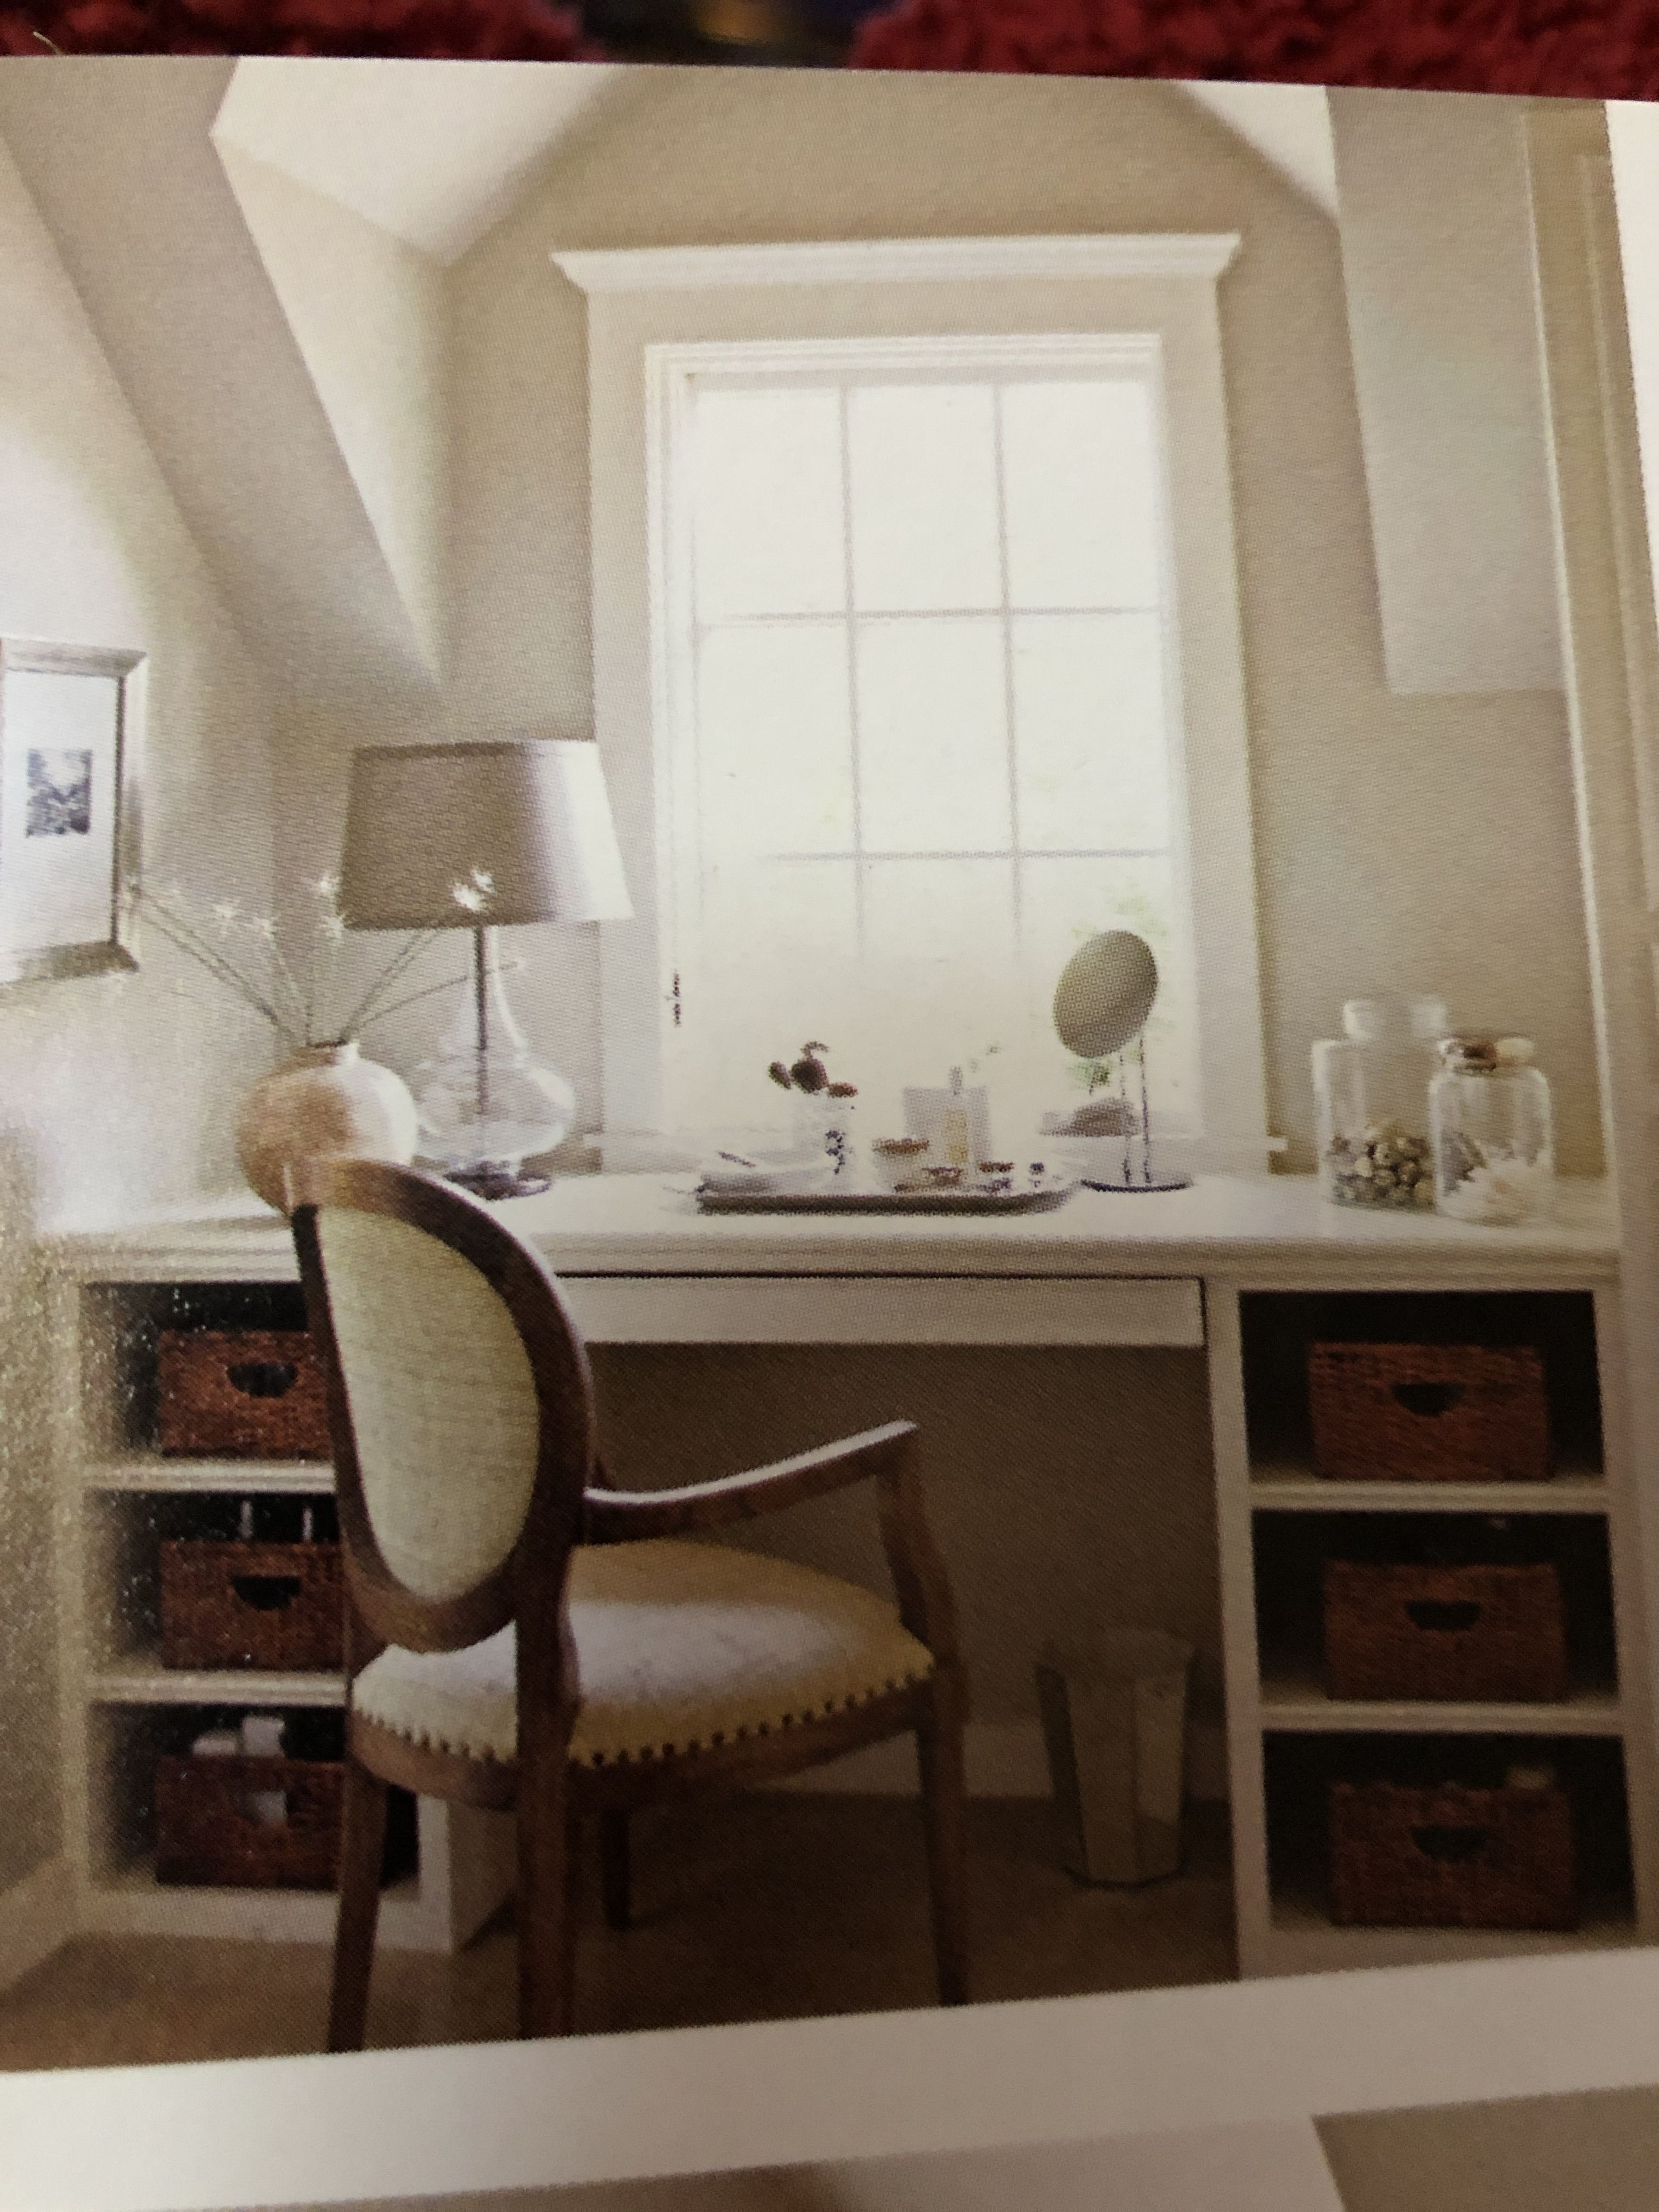 Desk or vanity area in a Dormer window in 2020 Dormer